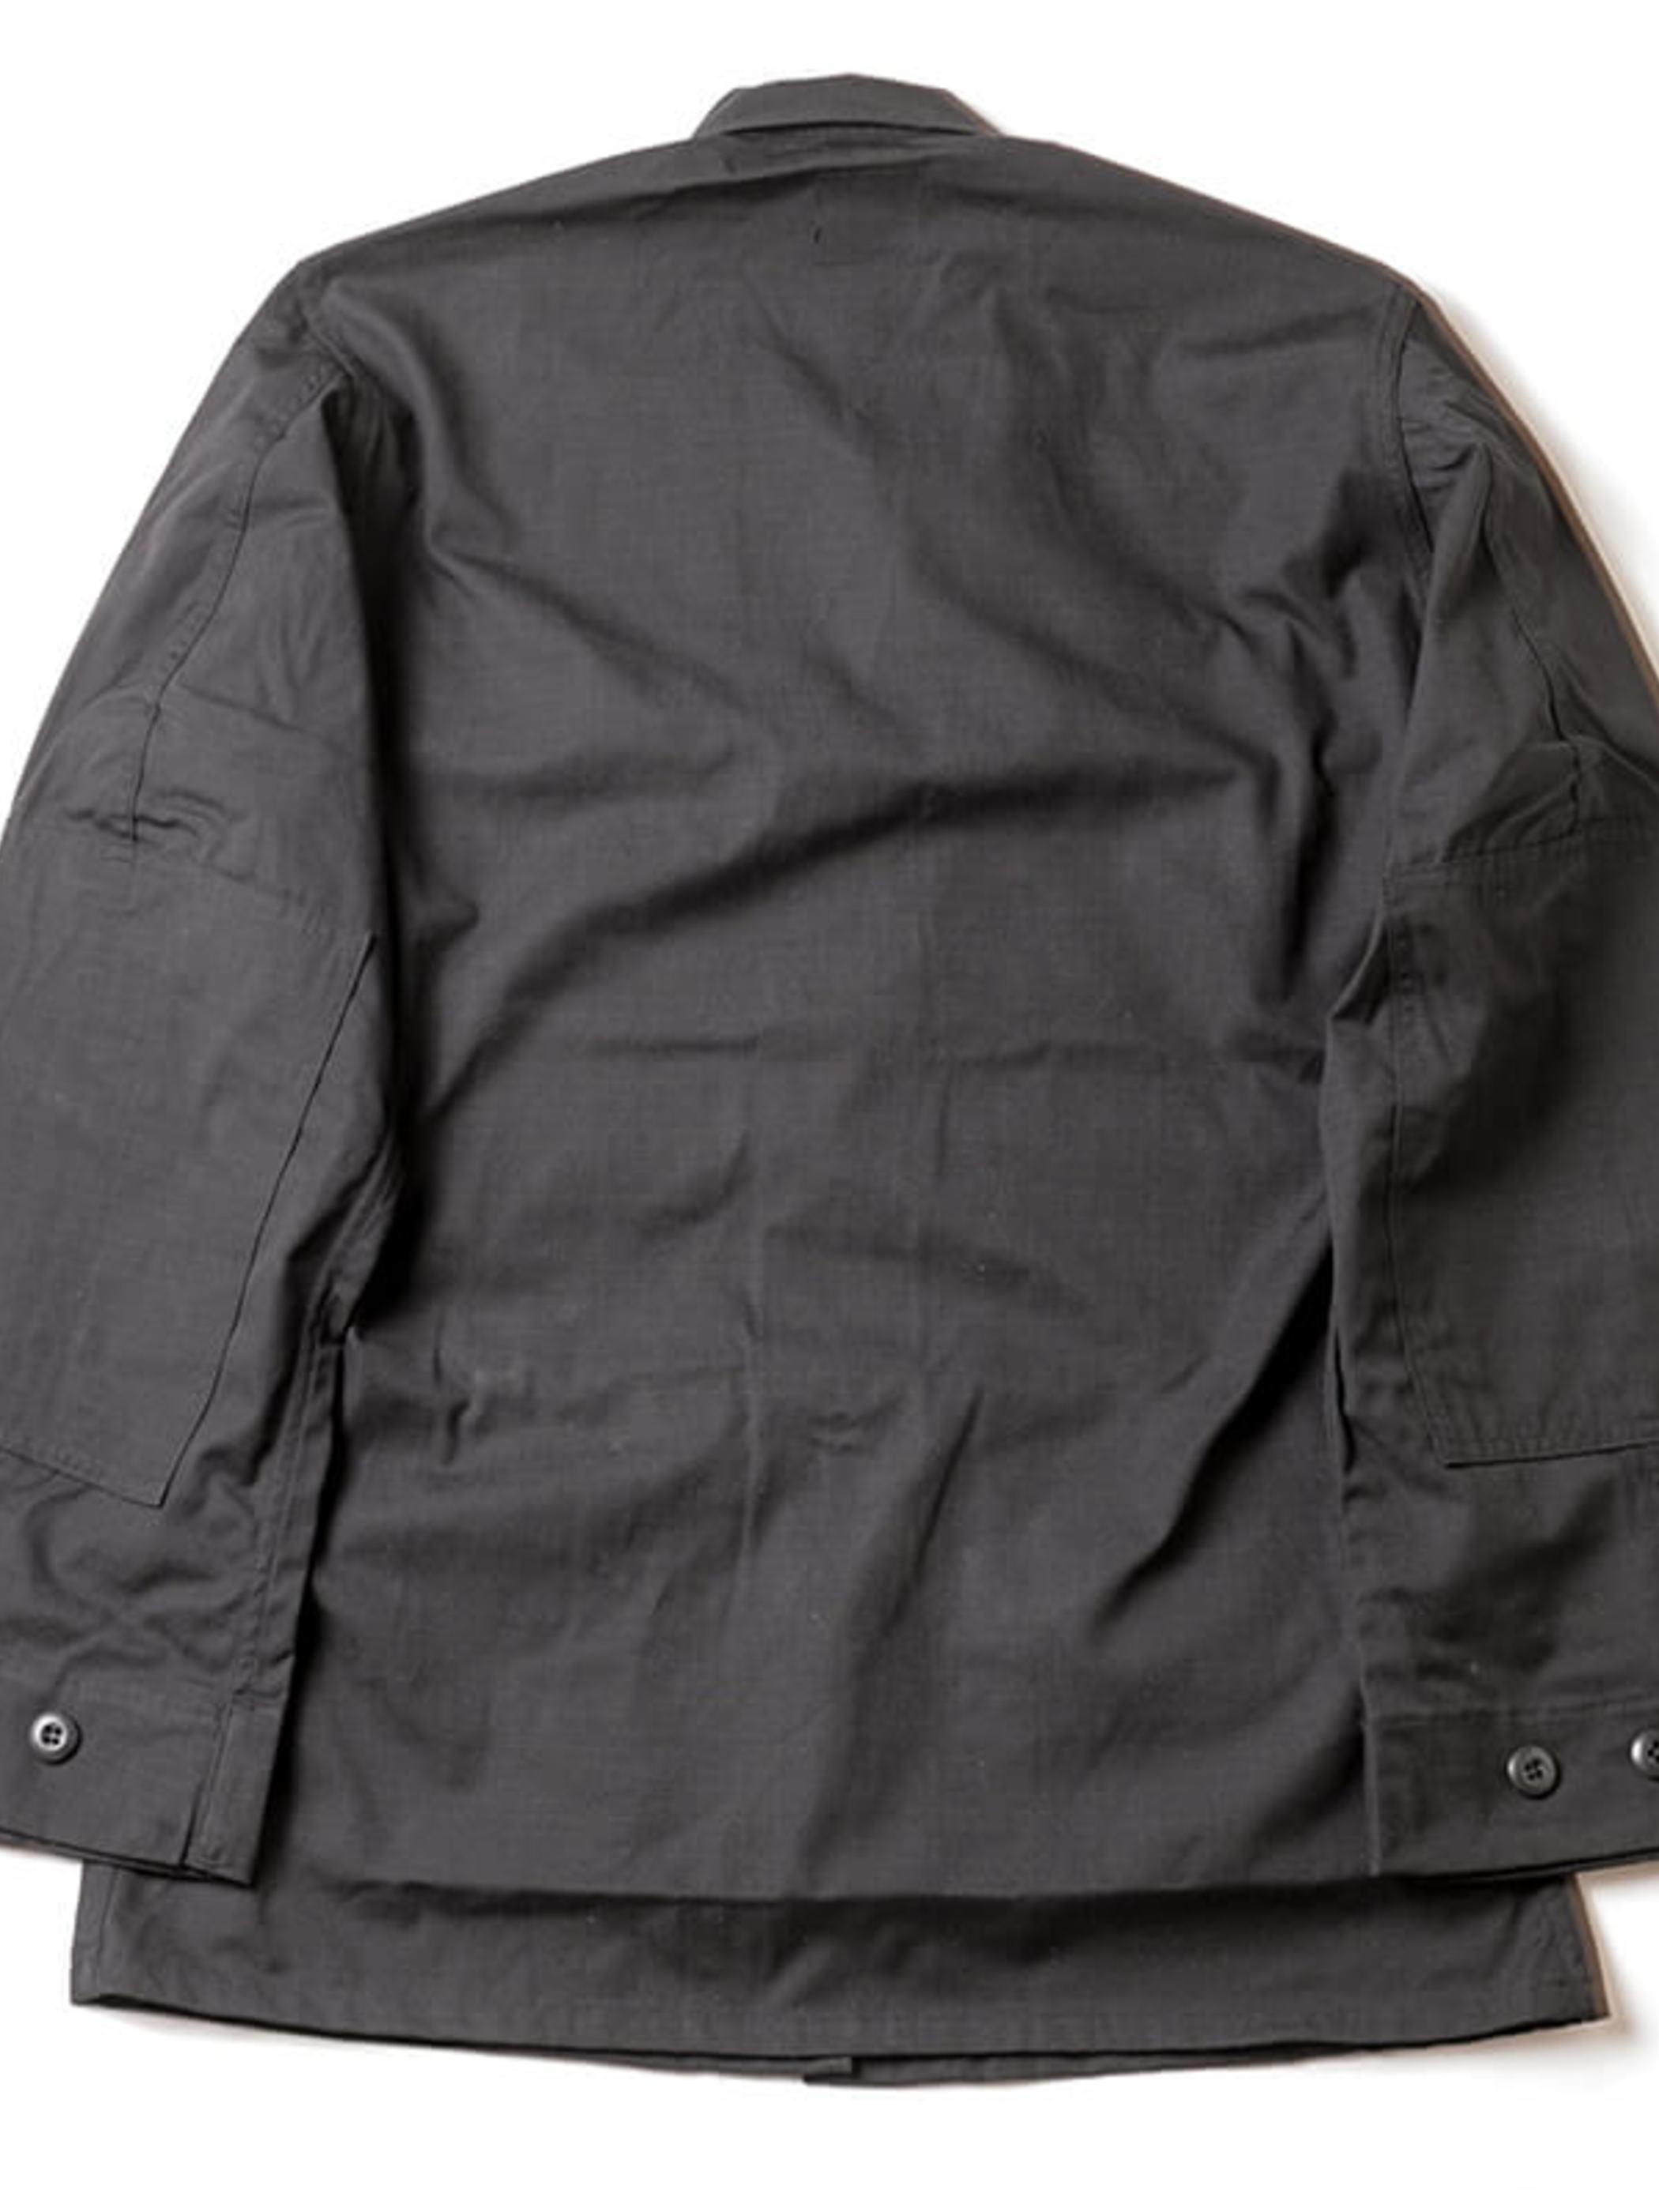 US Military / 1990's Deadstock / BDU Jacket / 357 Black